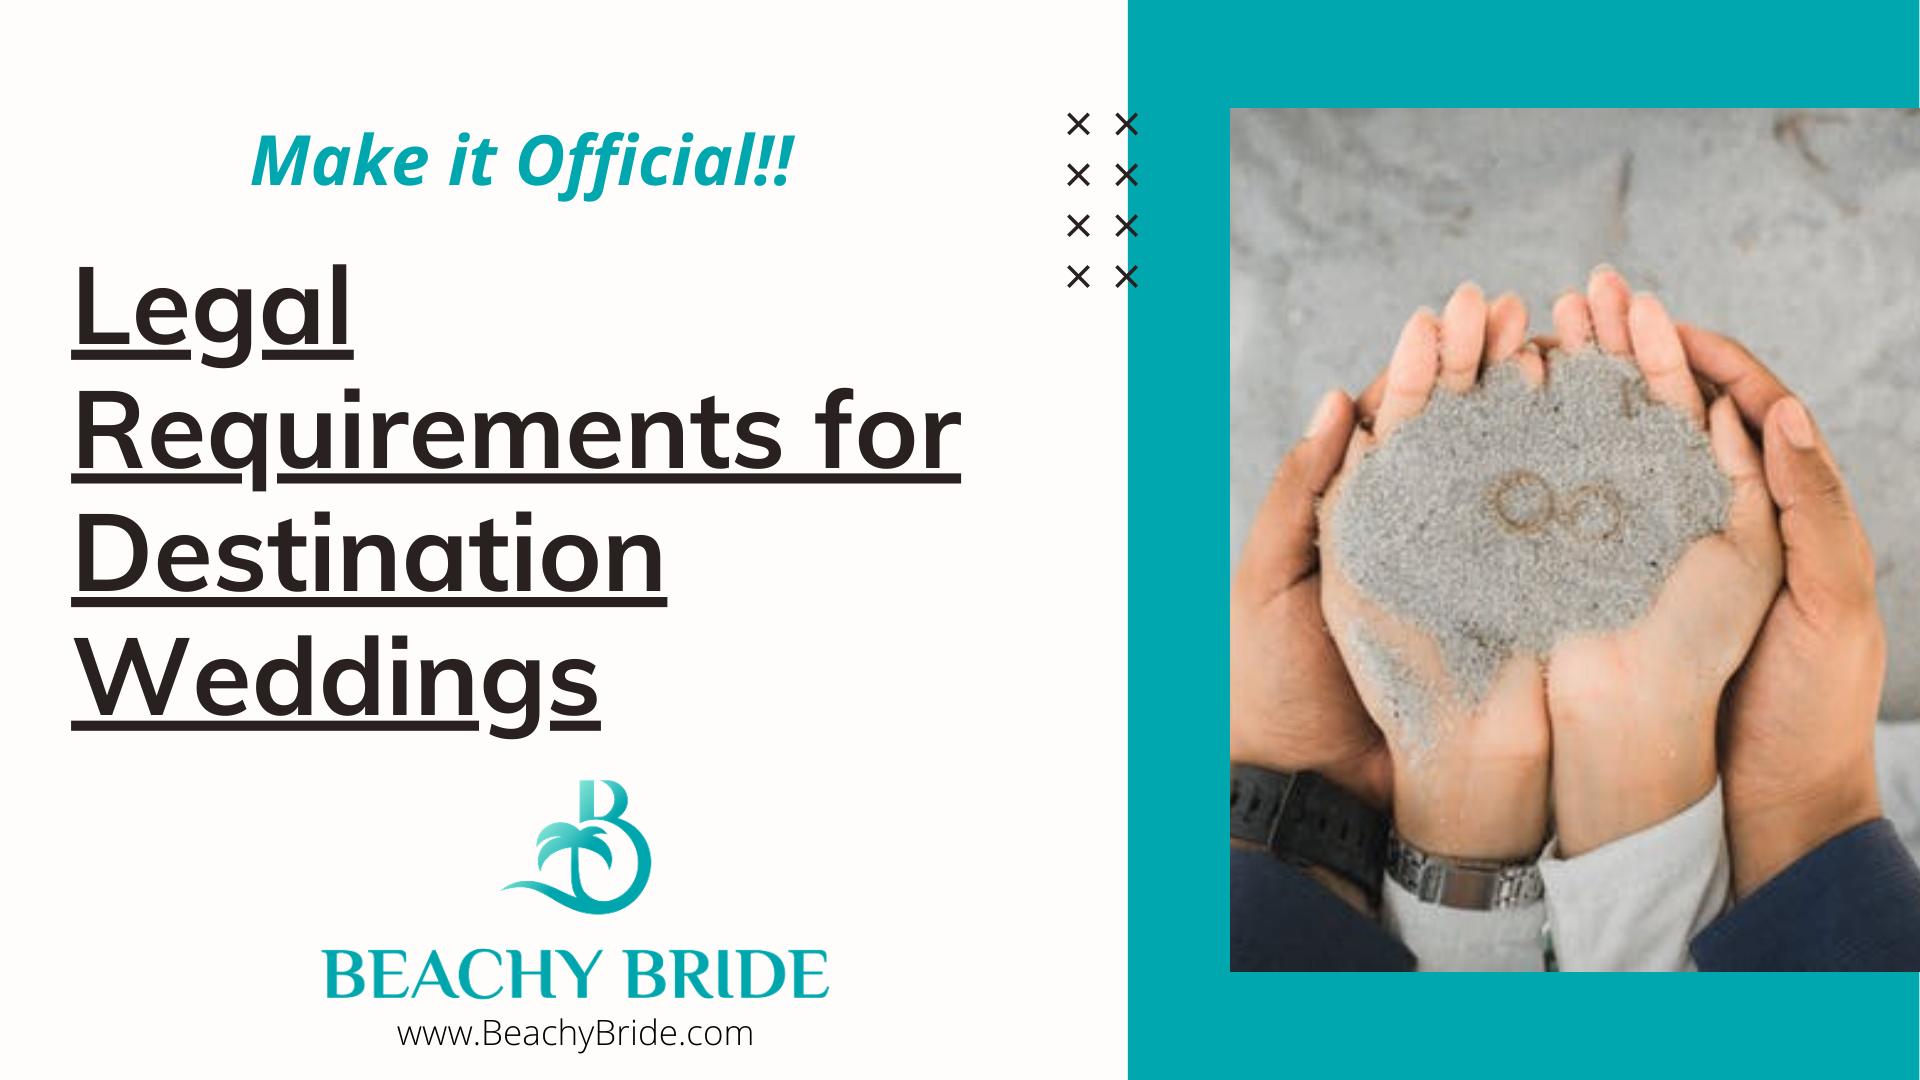 Destination Wedding Legal Requirements. 'image'